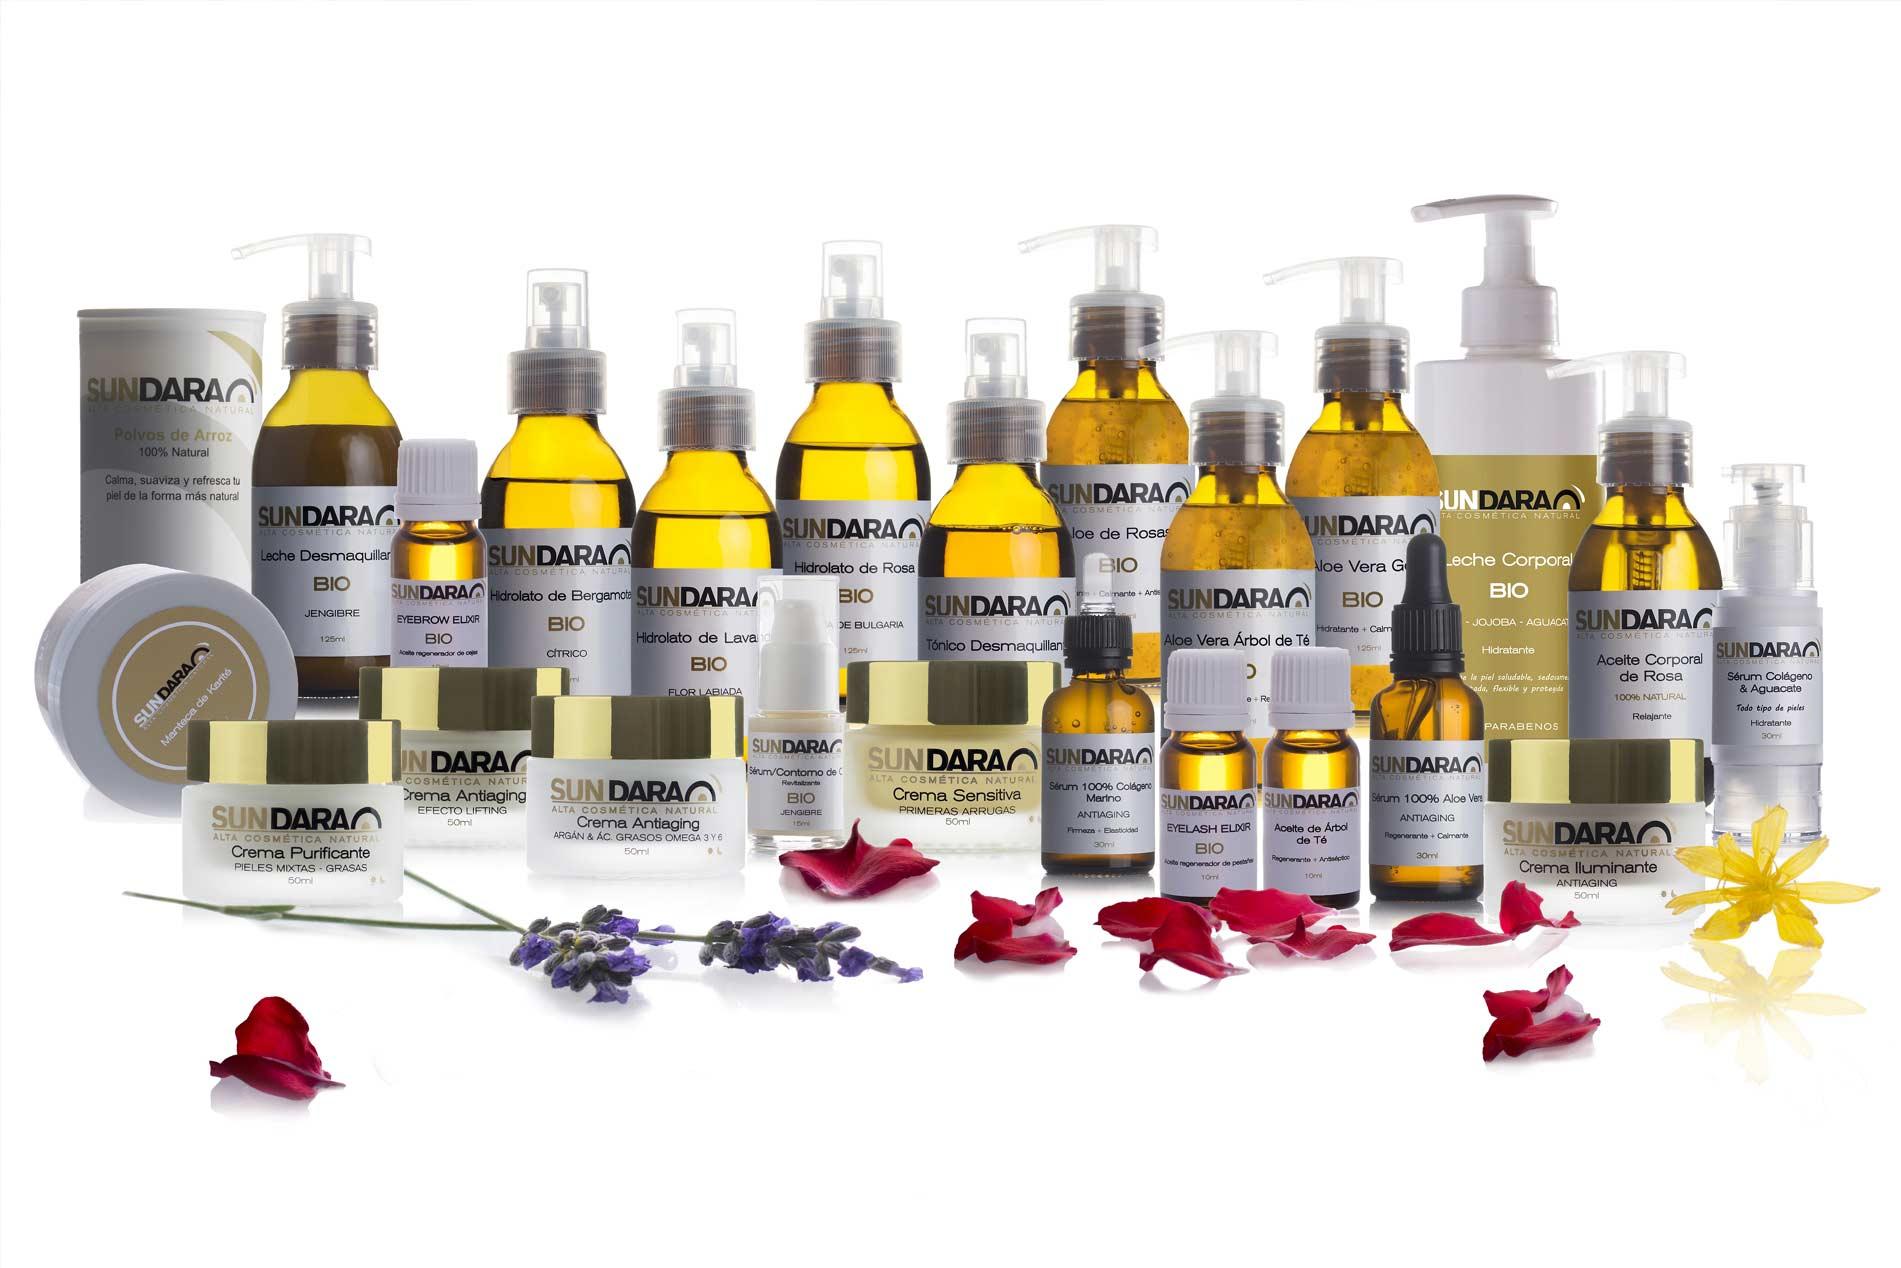 Bodegon_productos Sundara